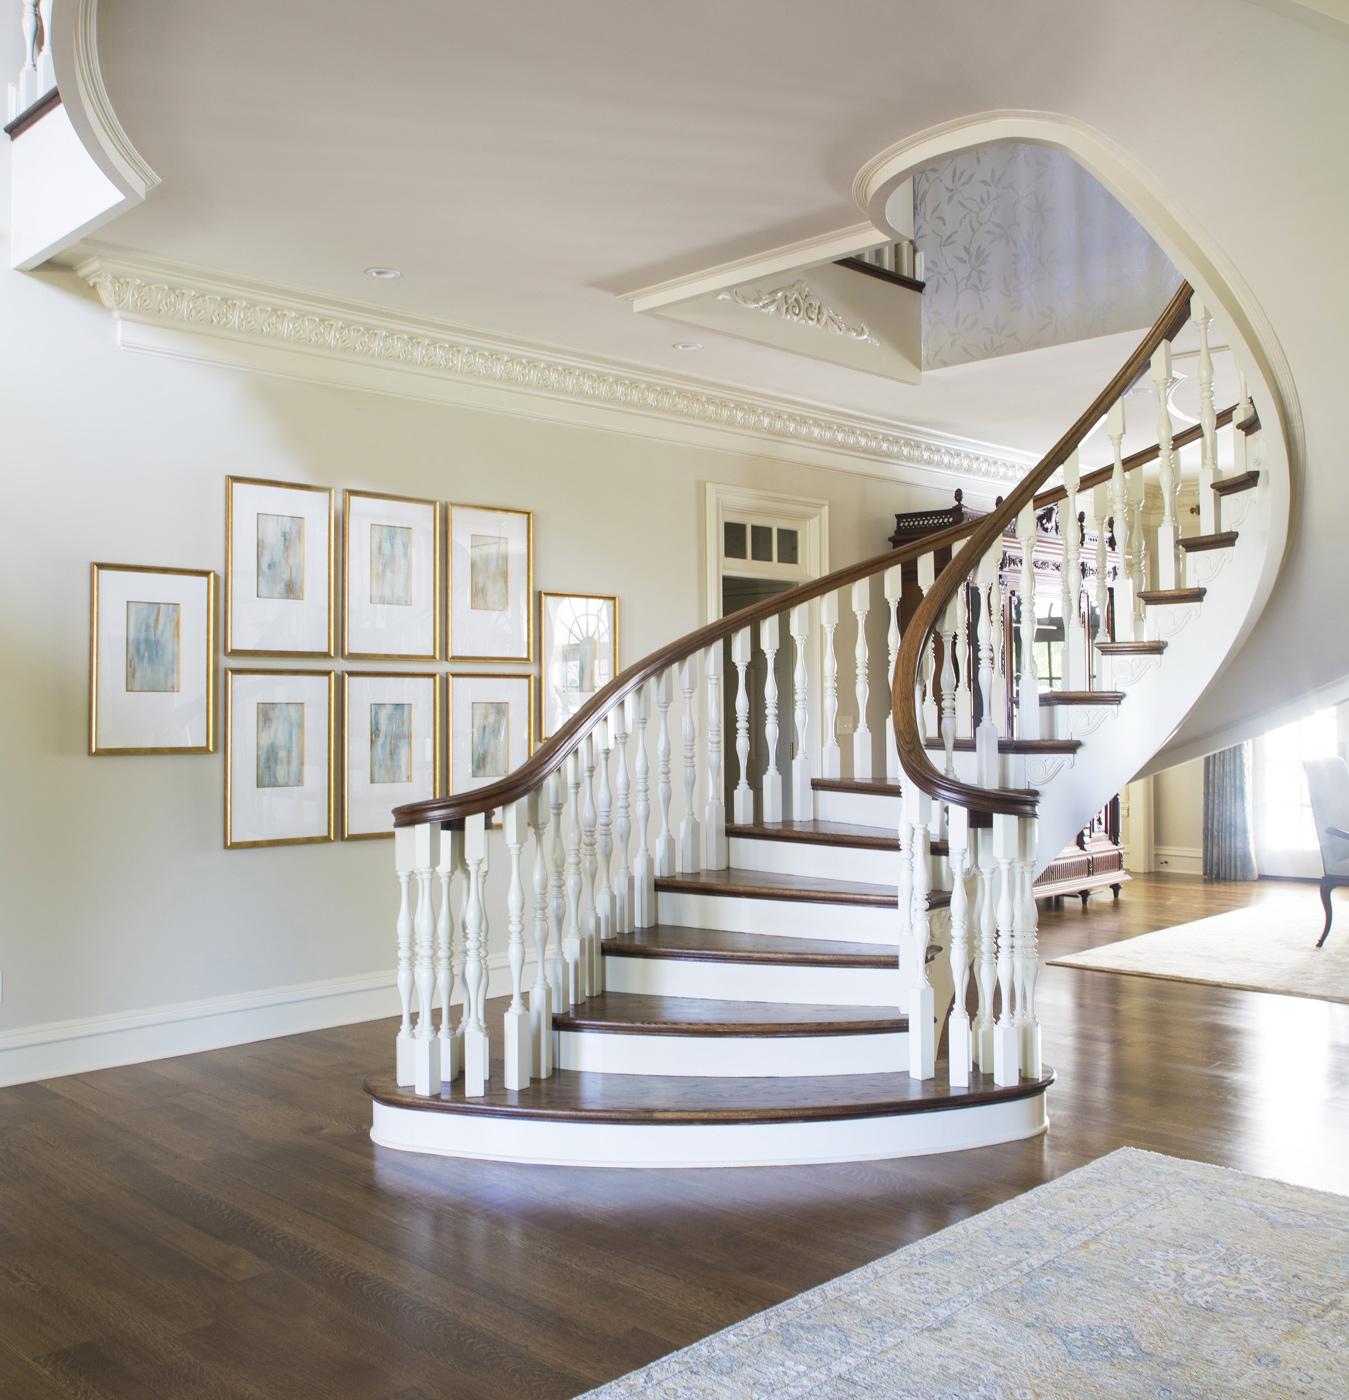 Cindy-McCord-Interior-Design-Collierville-House-014.jpg